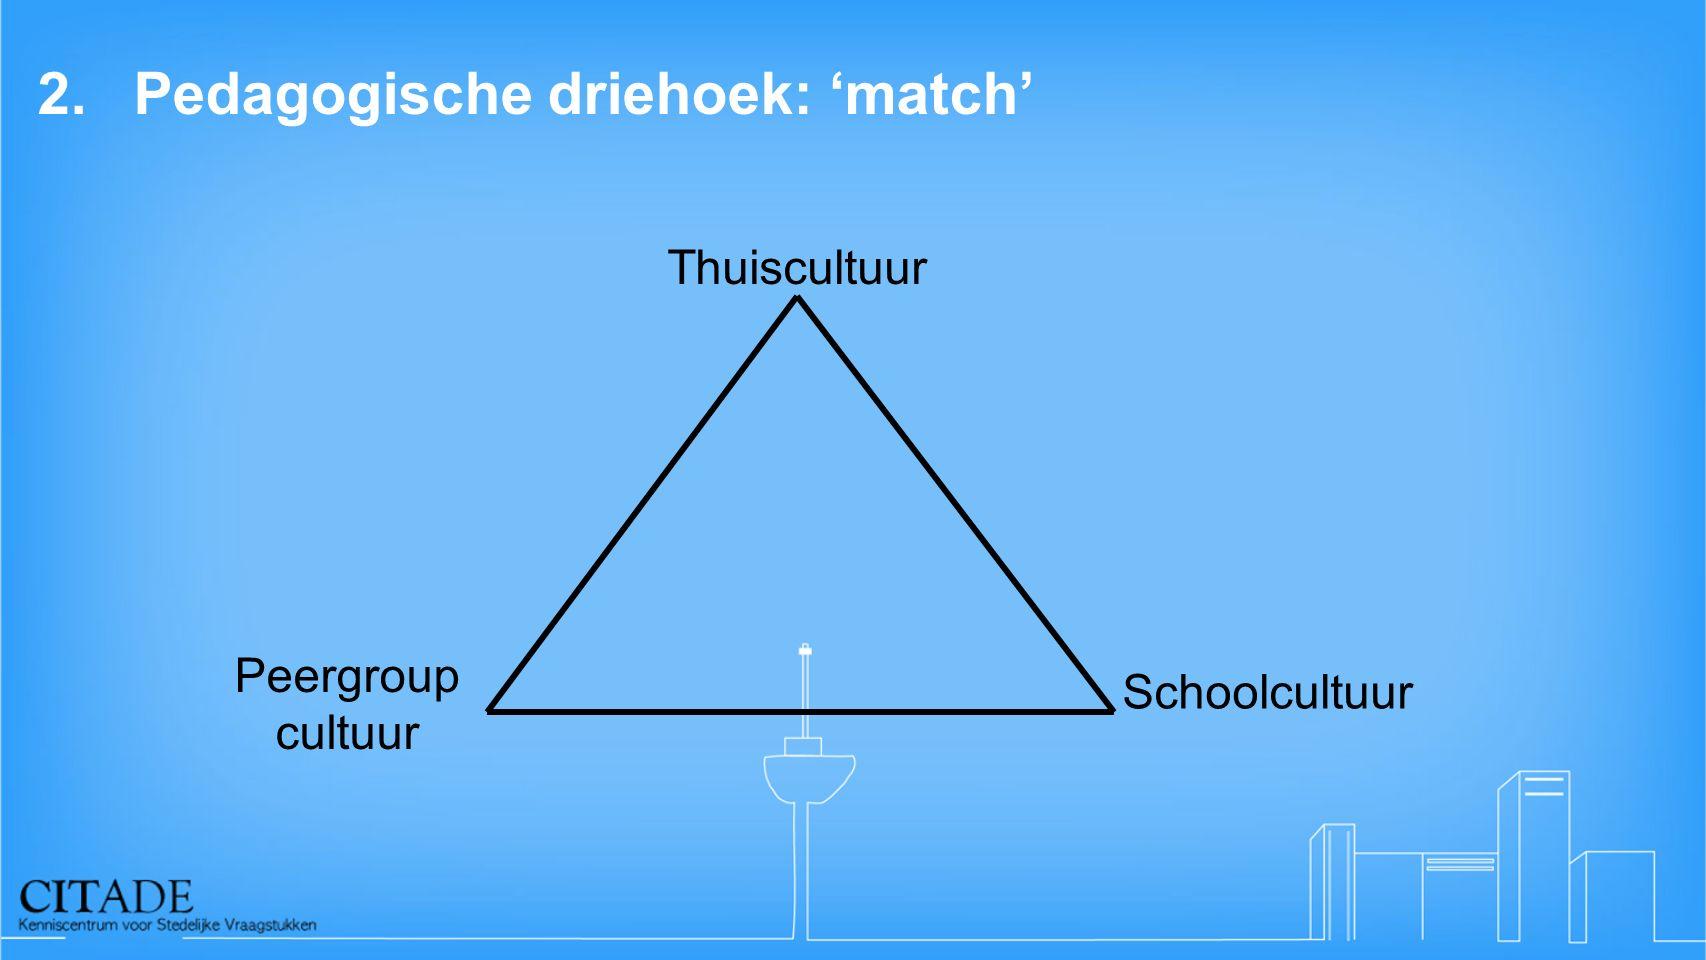 2. Pedagogische driehoek: 'match'